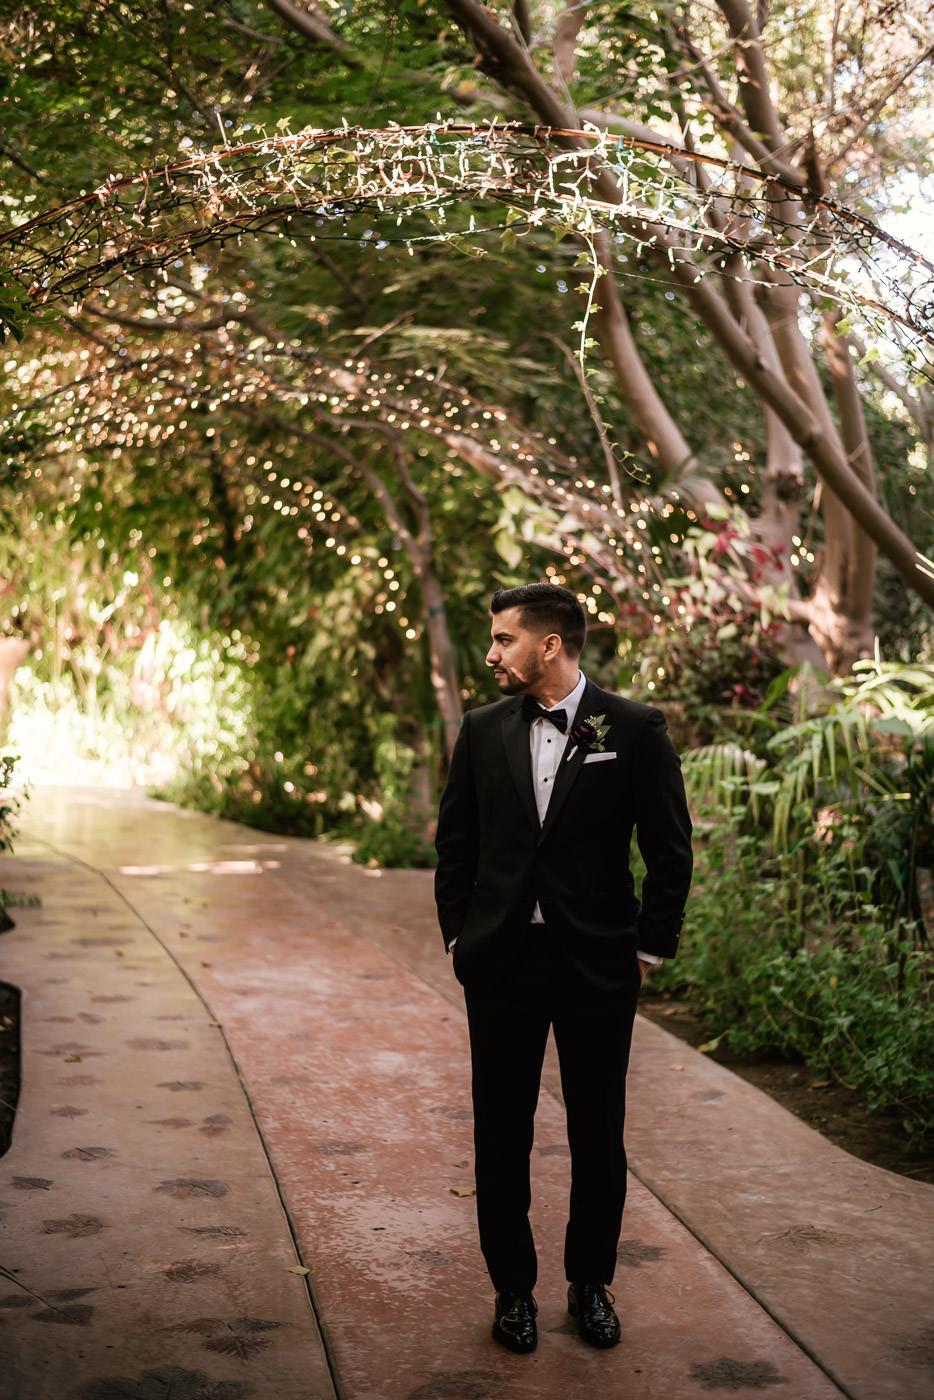 eden-gardens-wedding-photographer-romantic-21.jpg